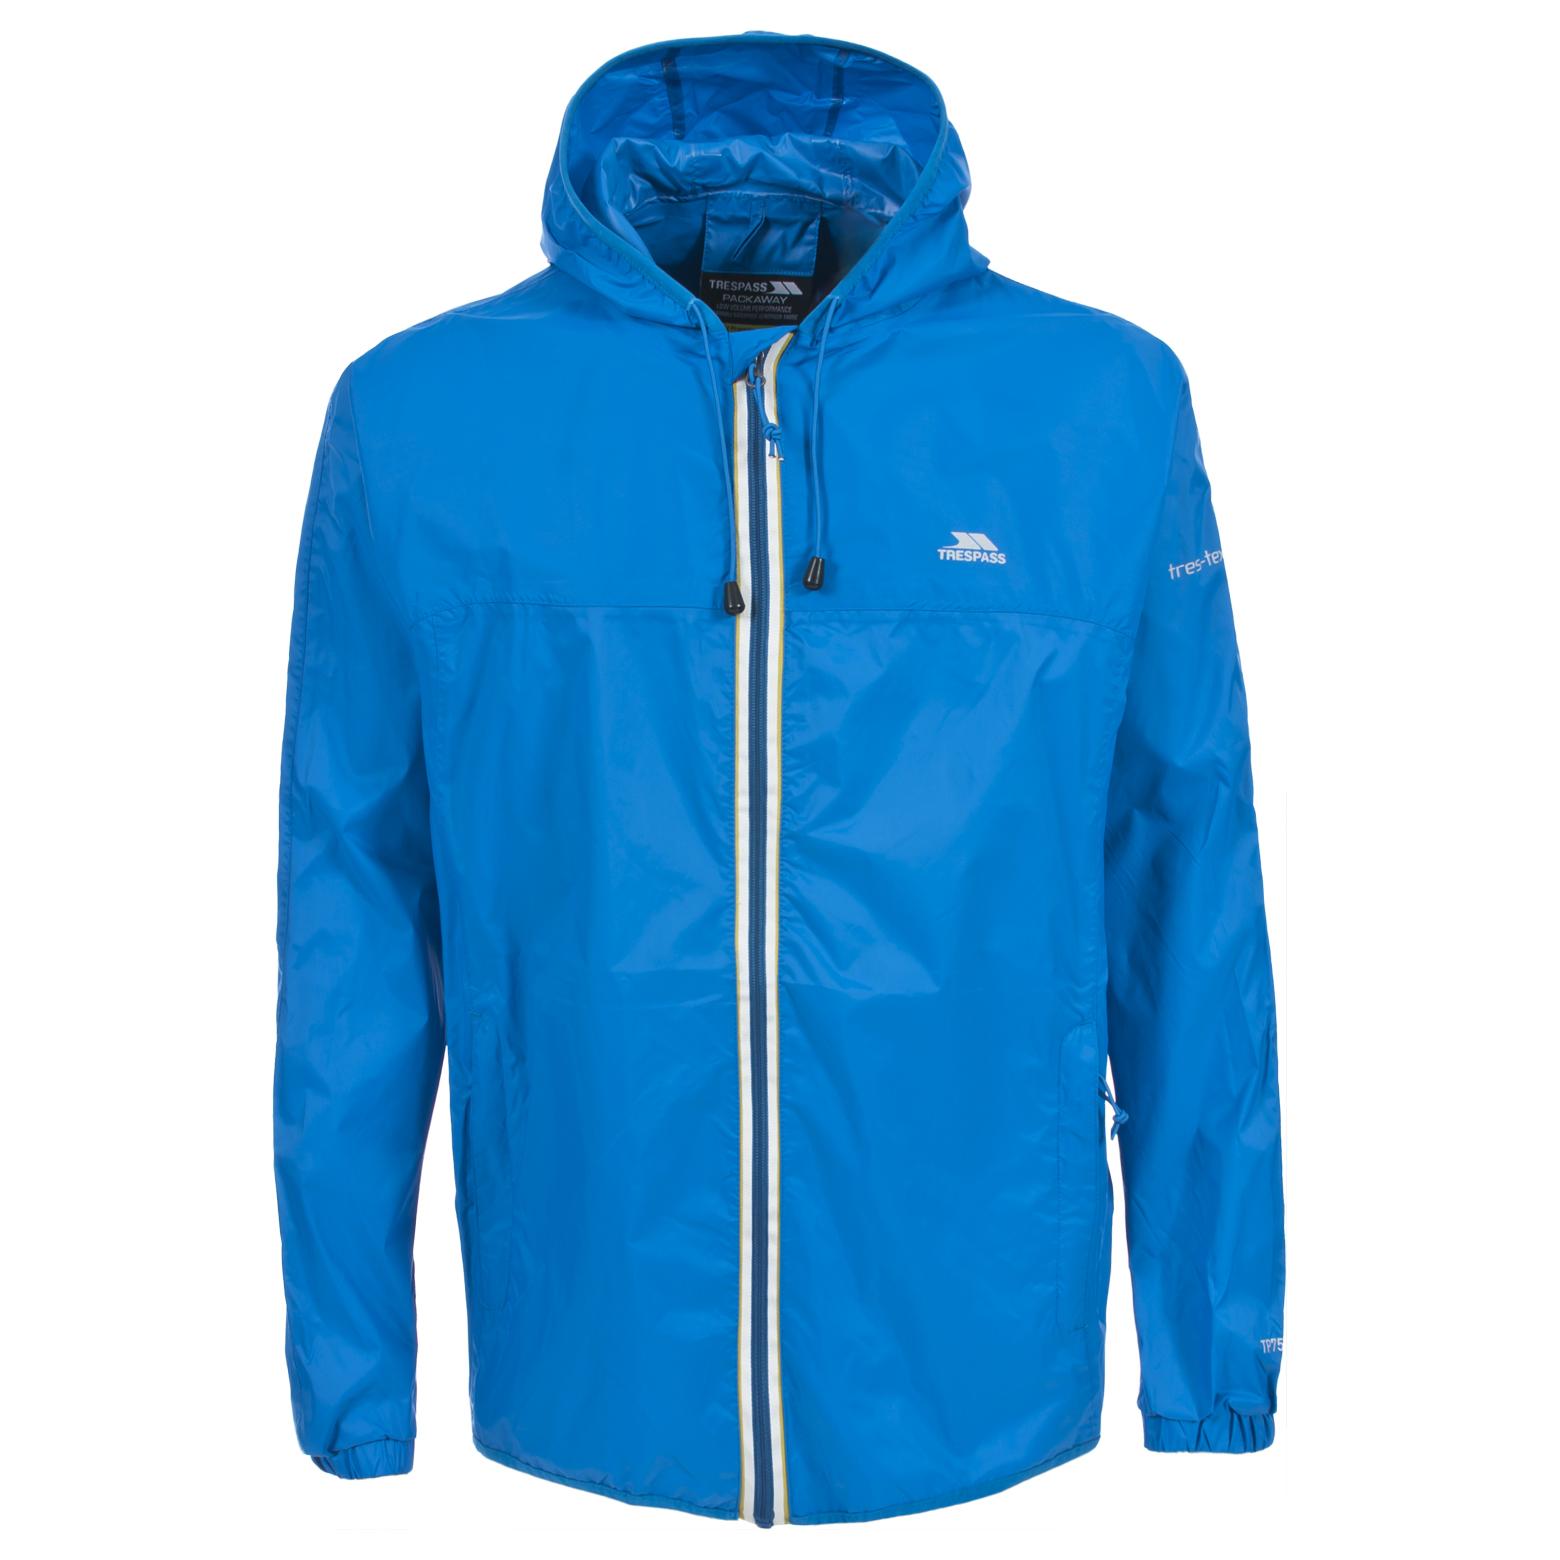 trespass malone mens waterproof breathable hooded rain coat jacket #1: malone majkrak elb a copy